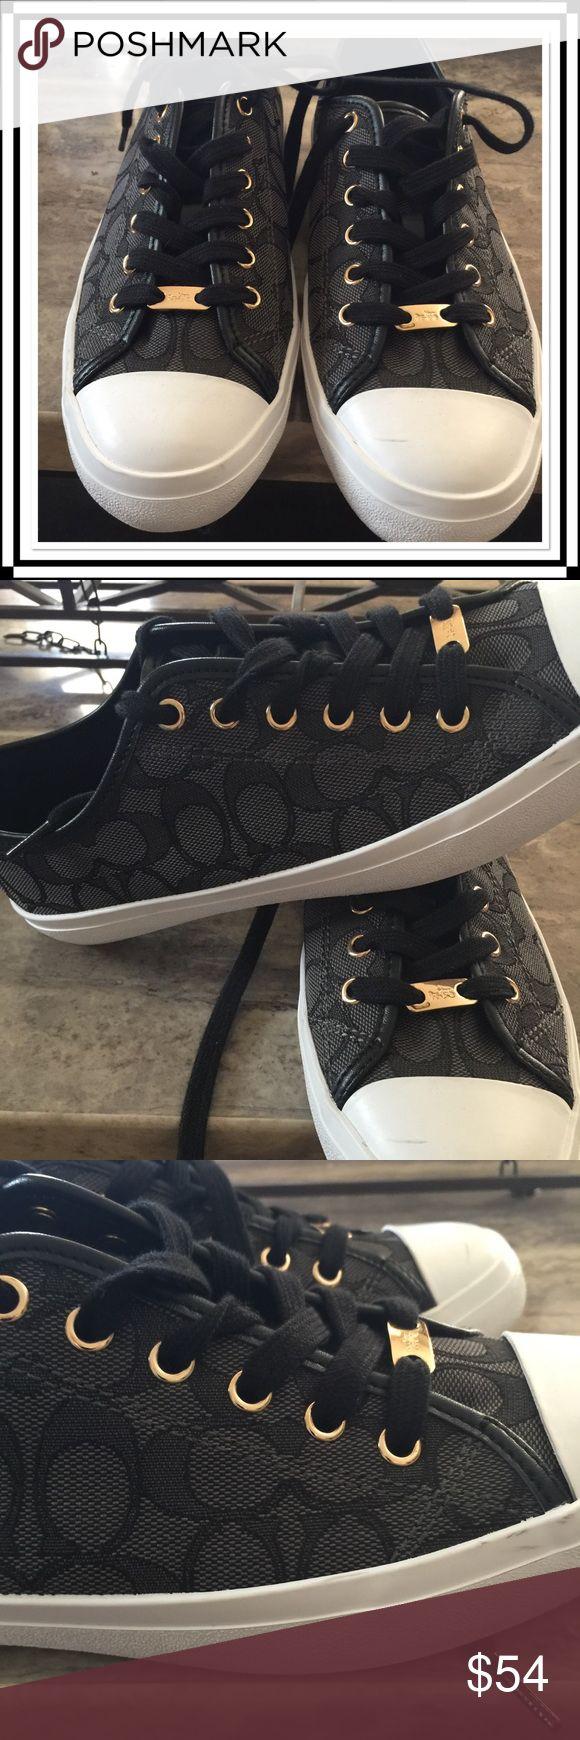 Coach NWOT tennis shoe Gorgeous Coach tennis shoe, white leather gold hardware. NWOT. Coach Shoes Sneakers